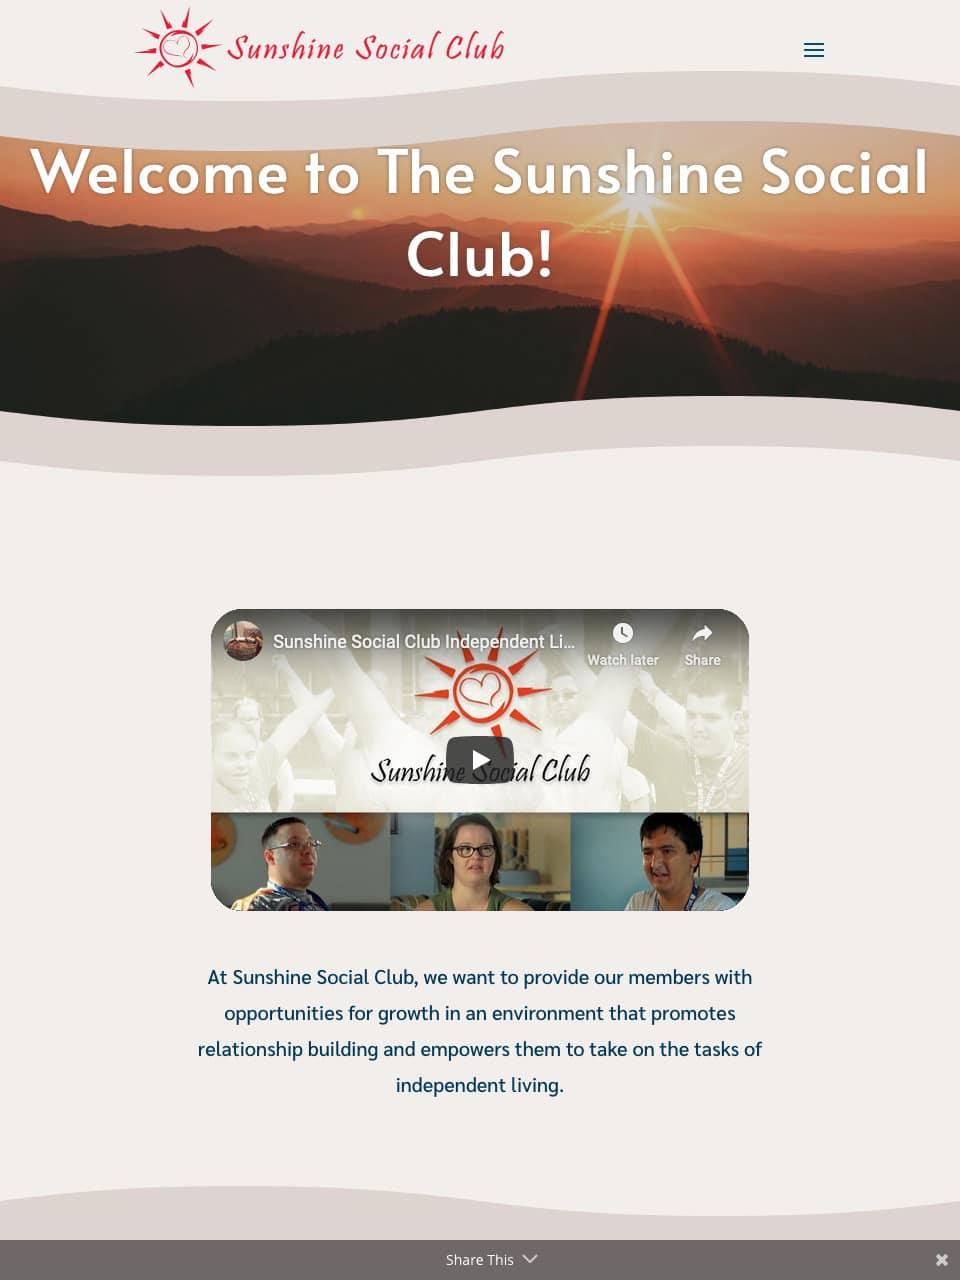 Image of website on tablet